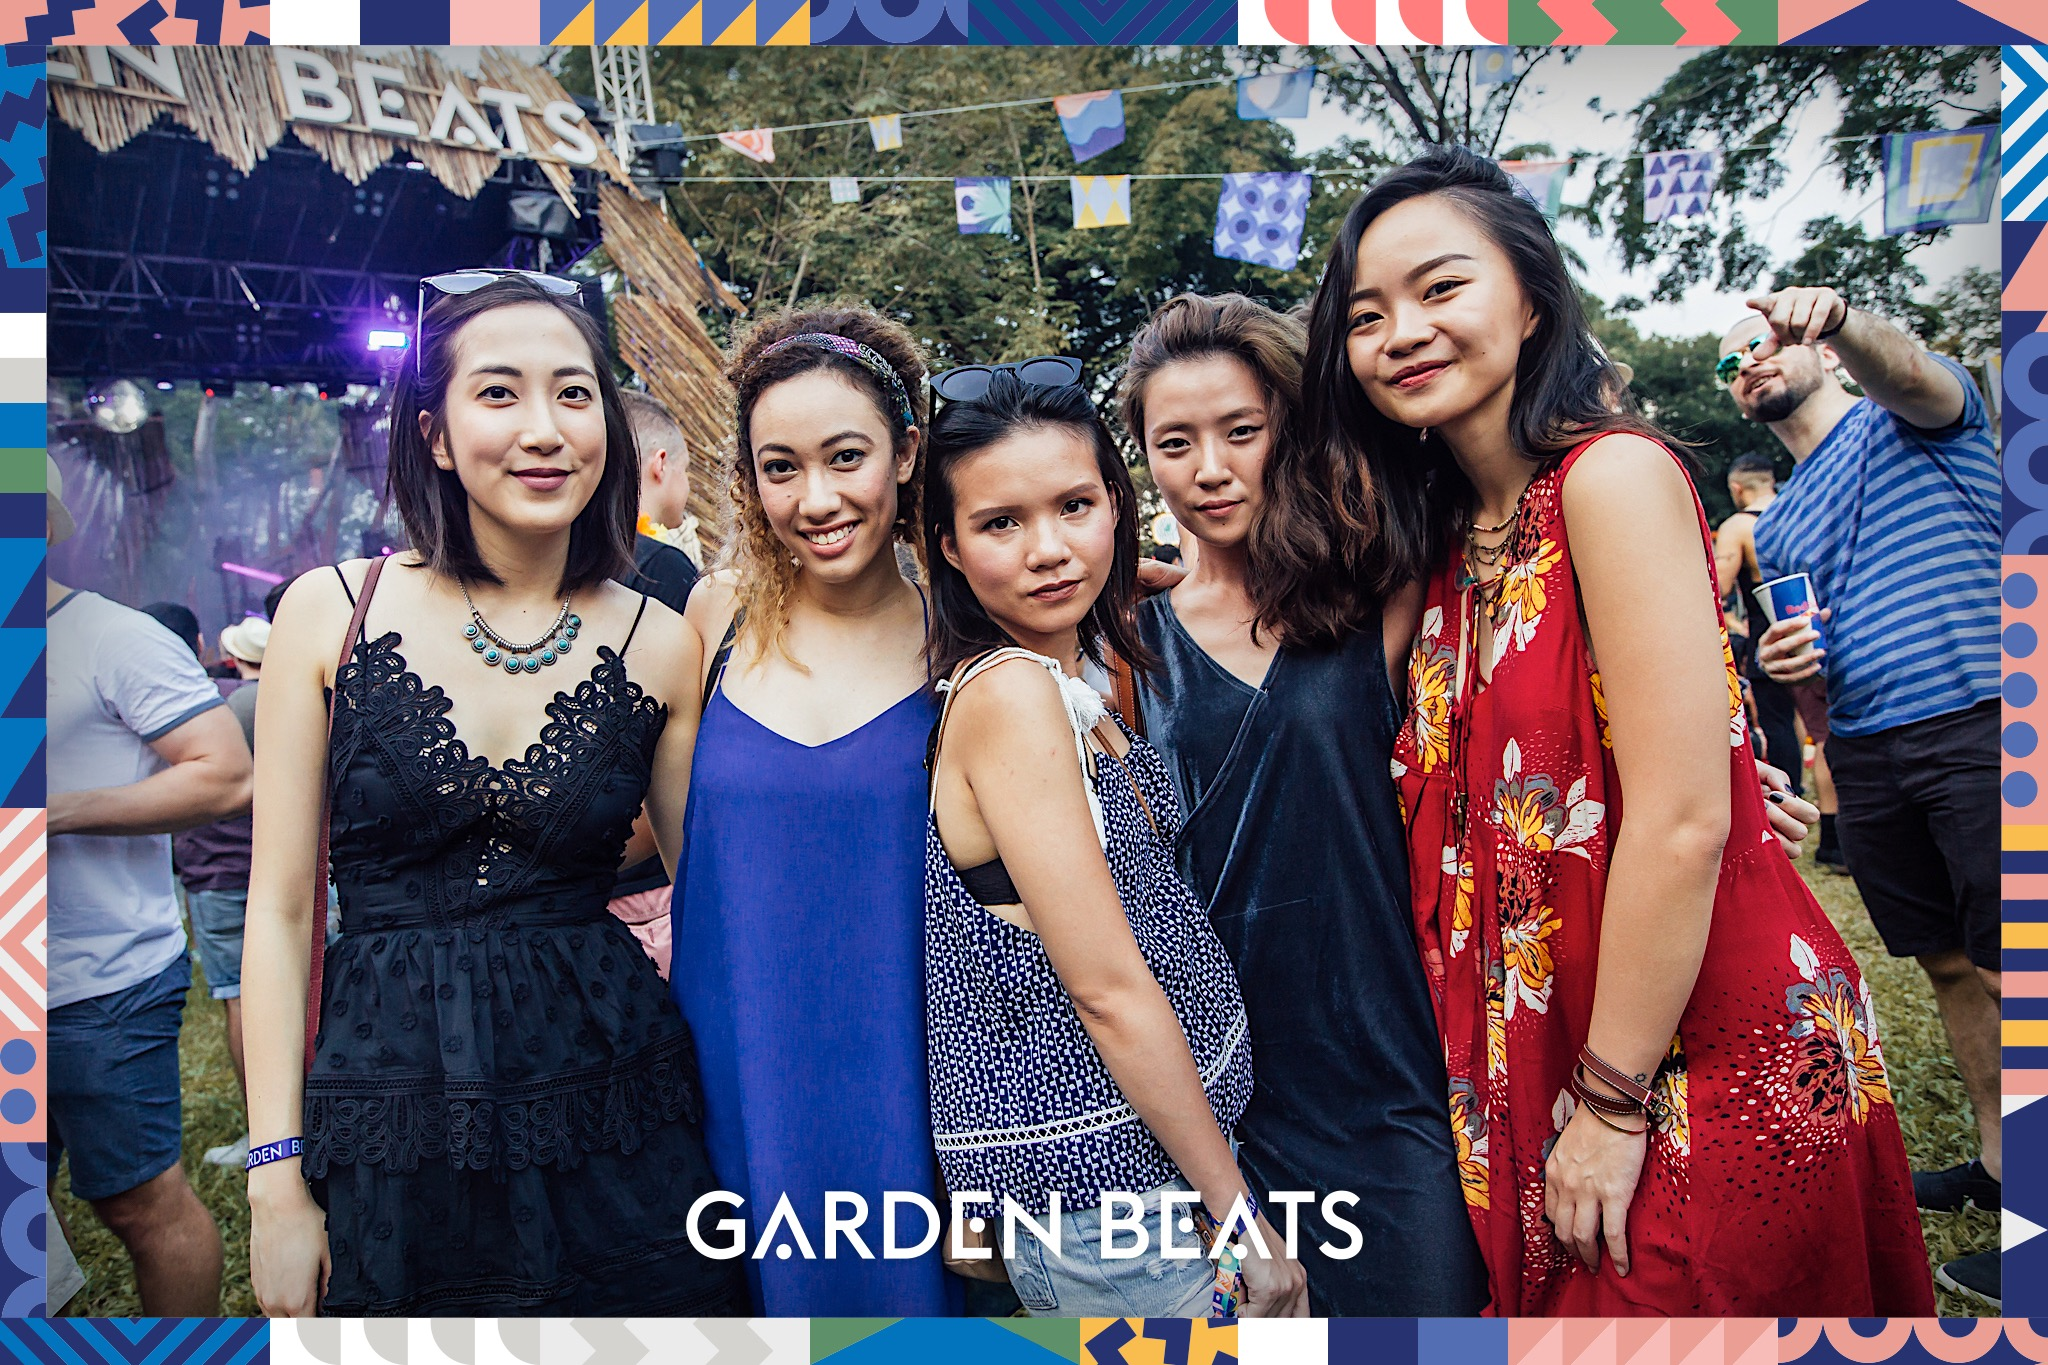 18032017_GardenBeats_Colossal570_WatermarkedGB.jpg